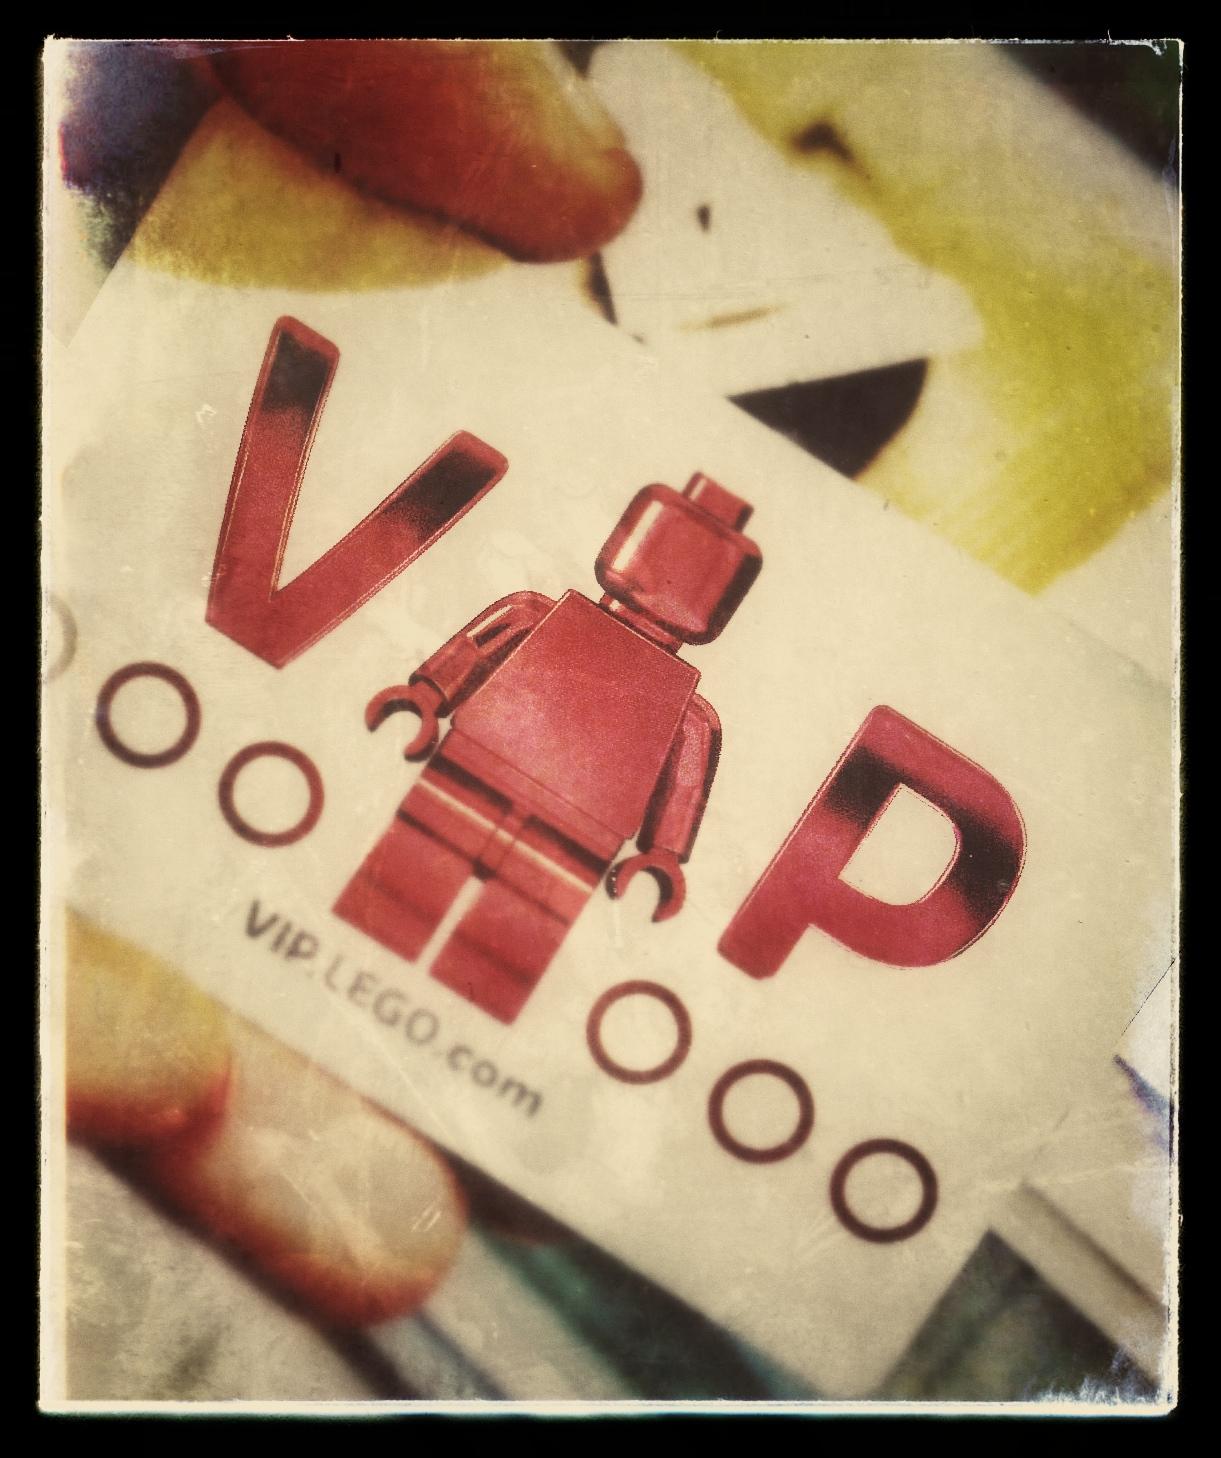 Lego Vip Clubkarte